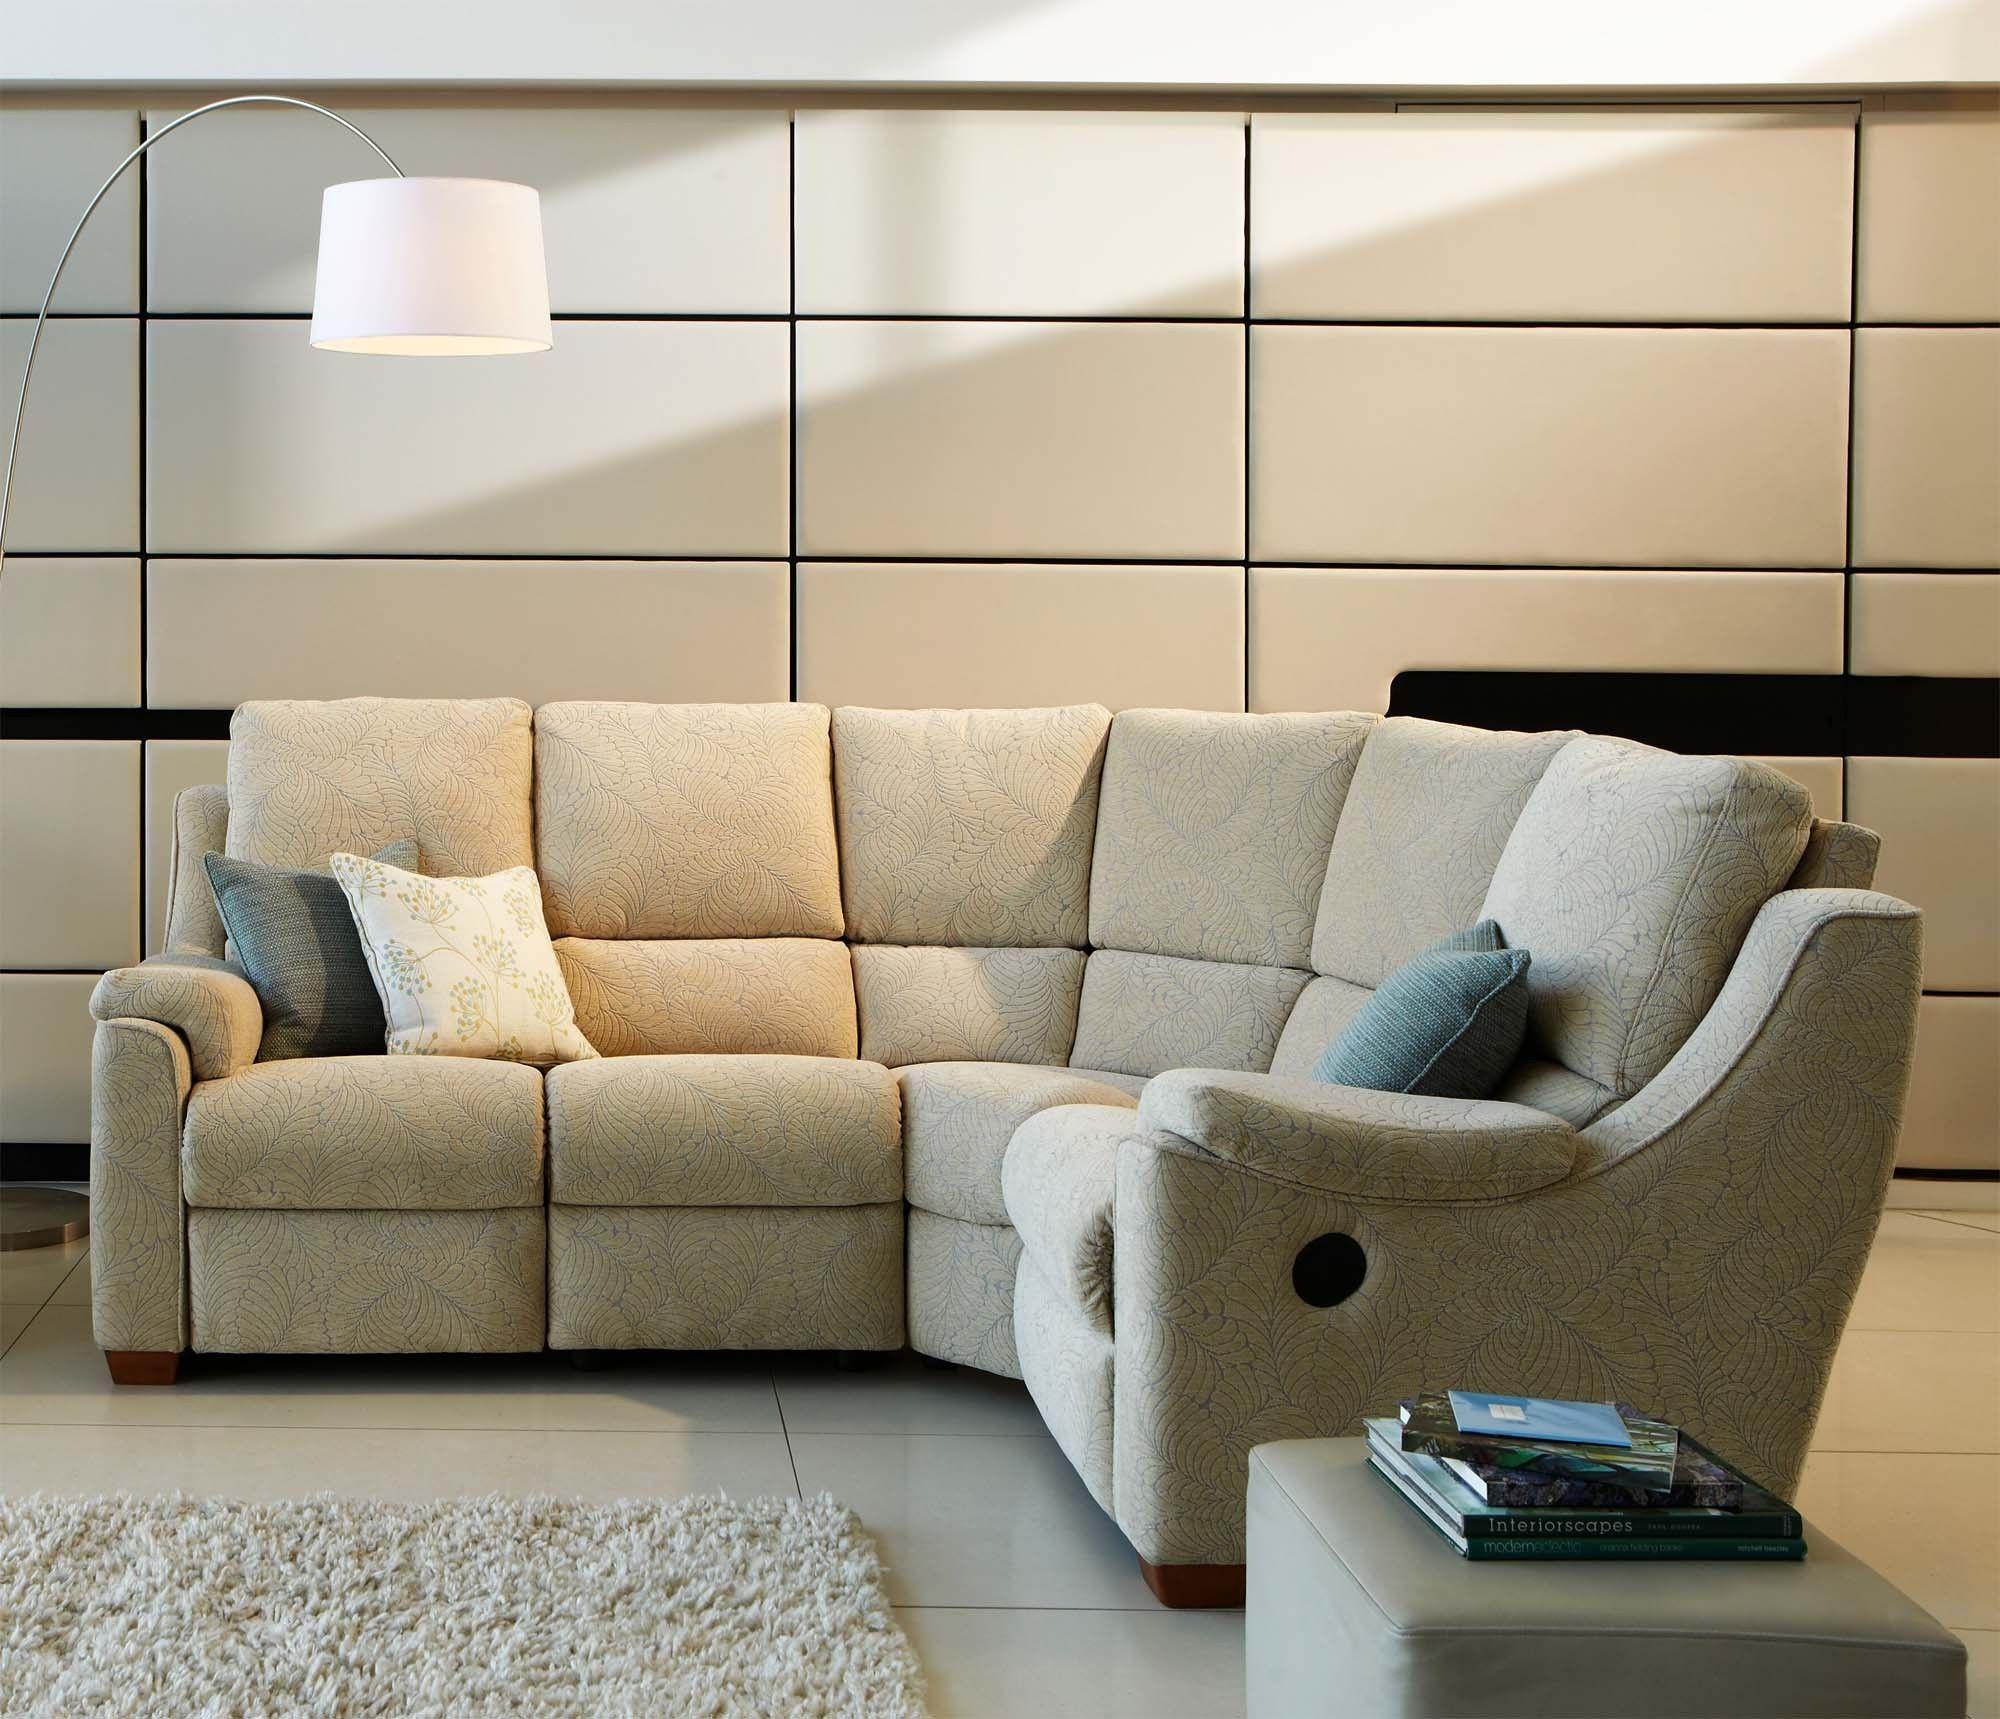 reagan furniture hayes york new